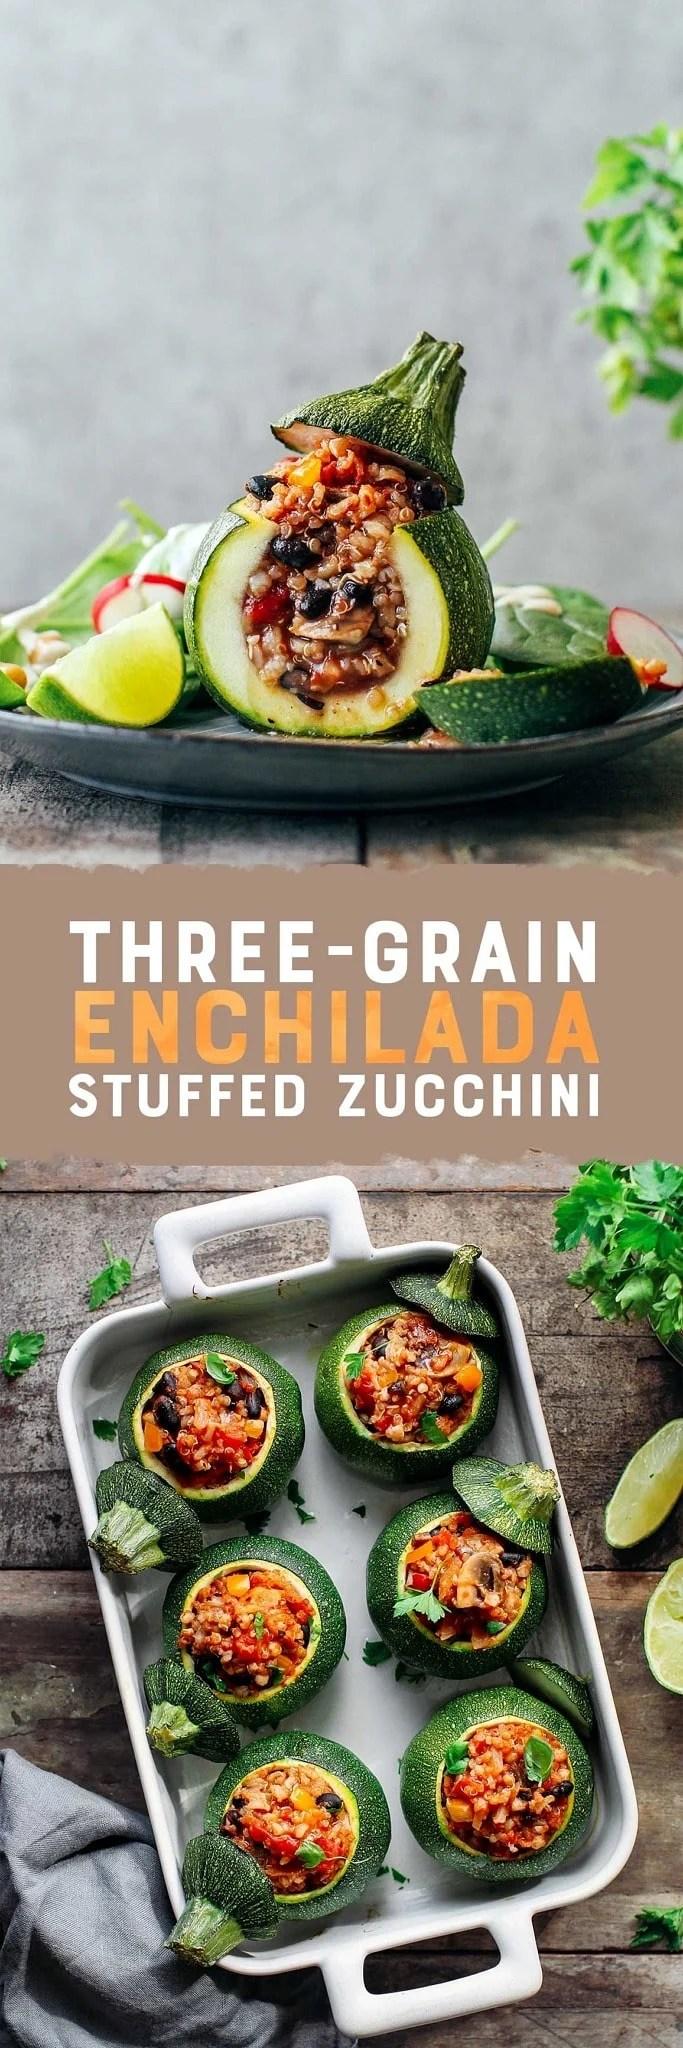 Three-Grain Enchilada Stuffed Zucchini